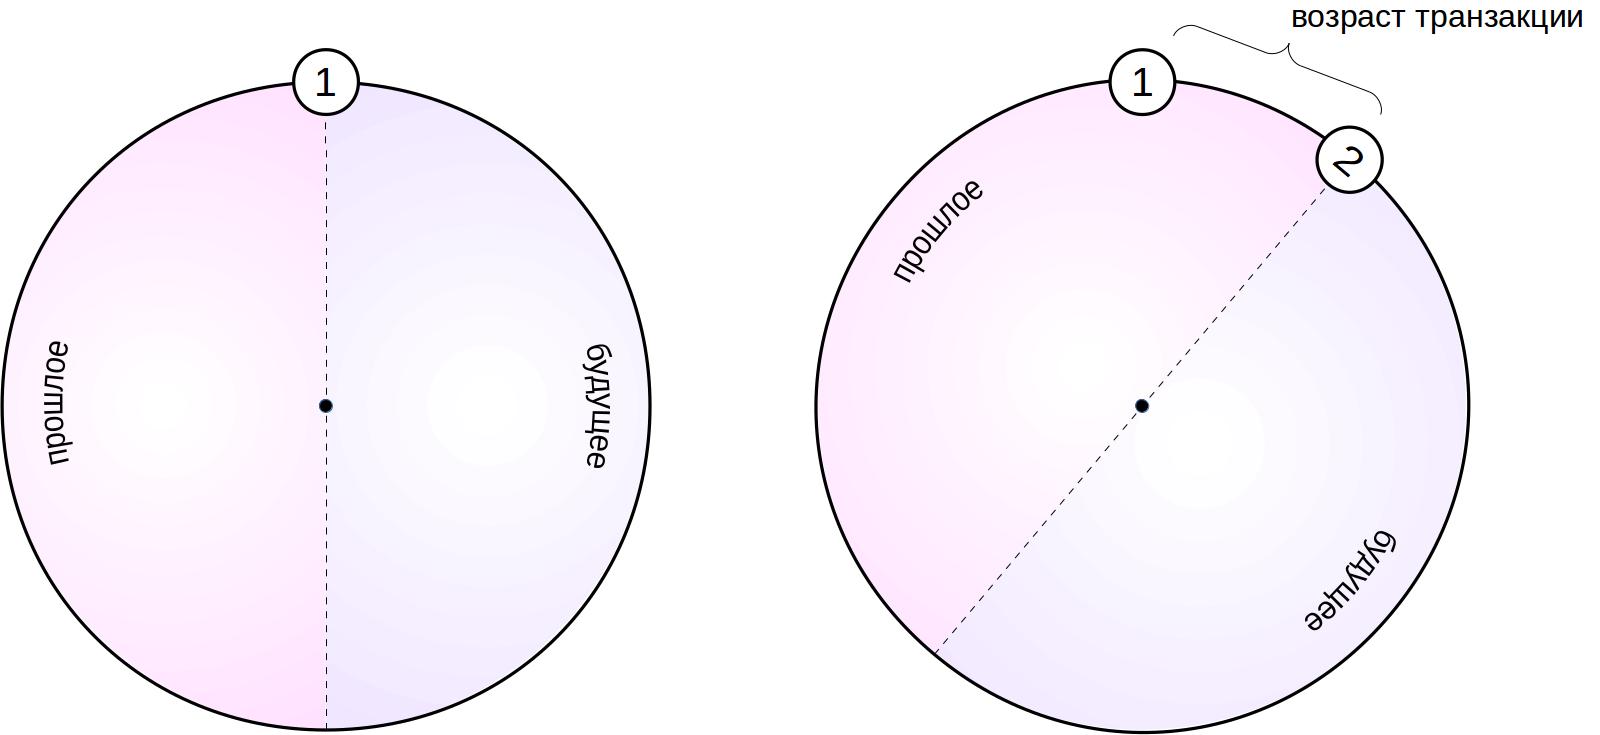 MVCC в PostgreSQL-8. Заморозка - 2